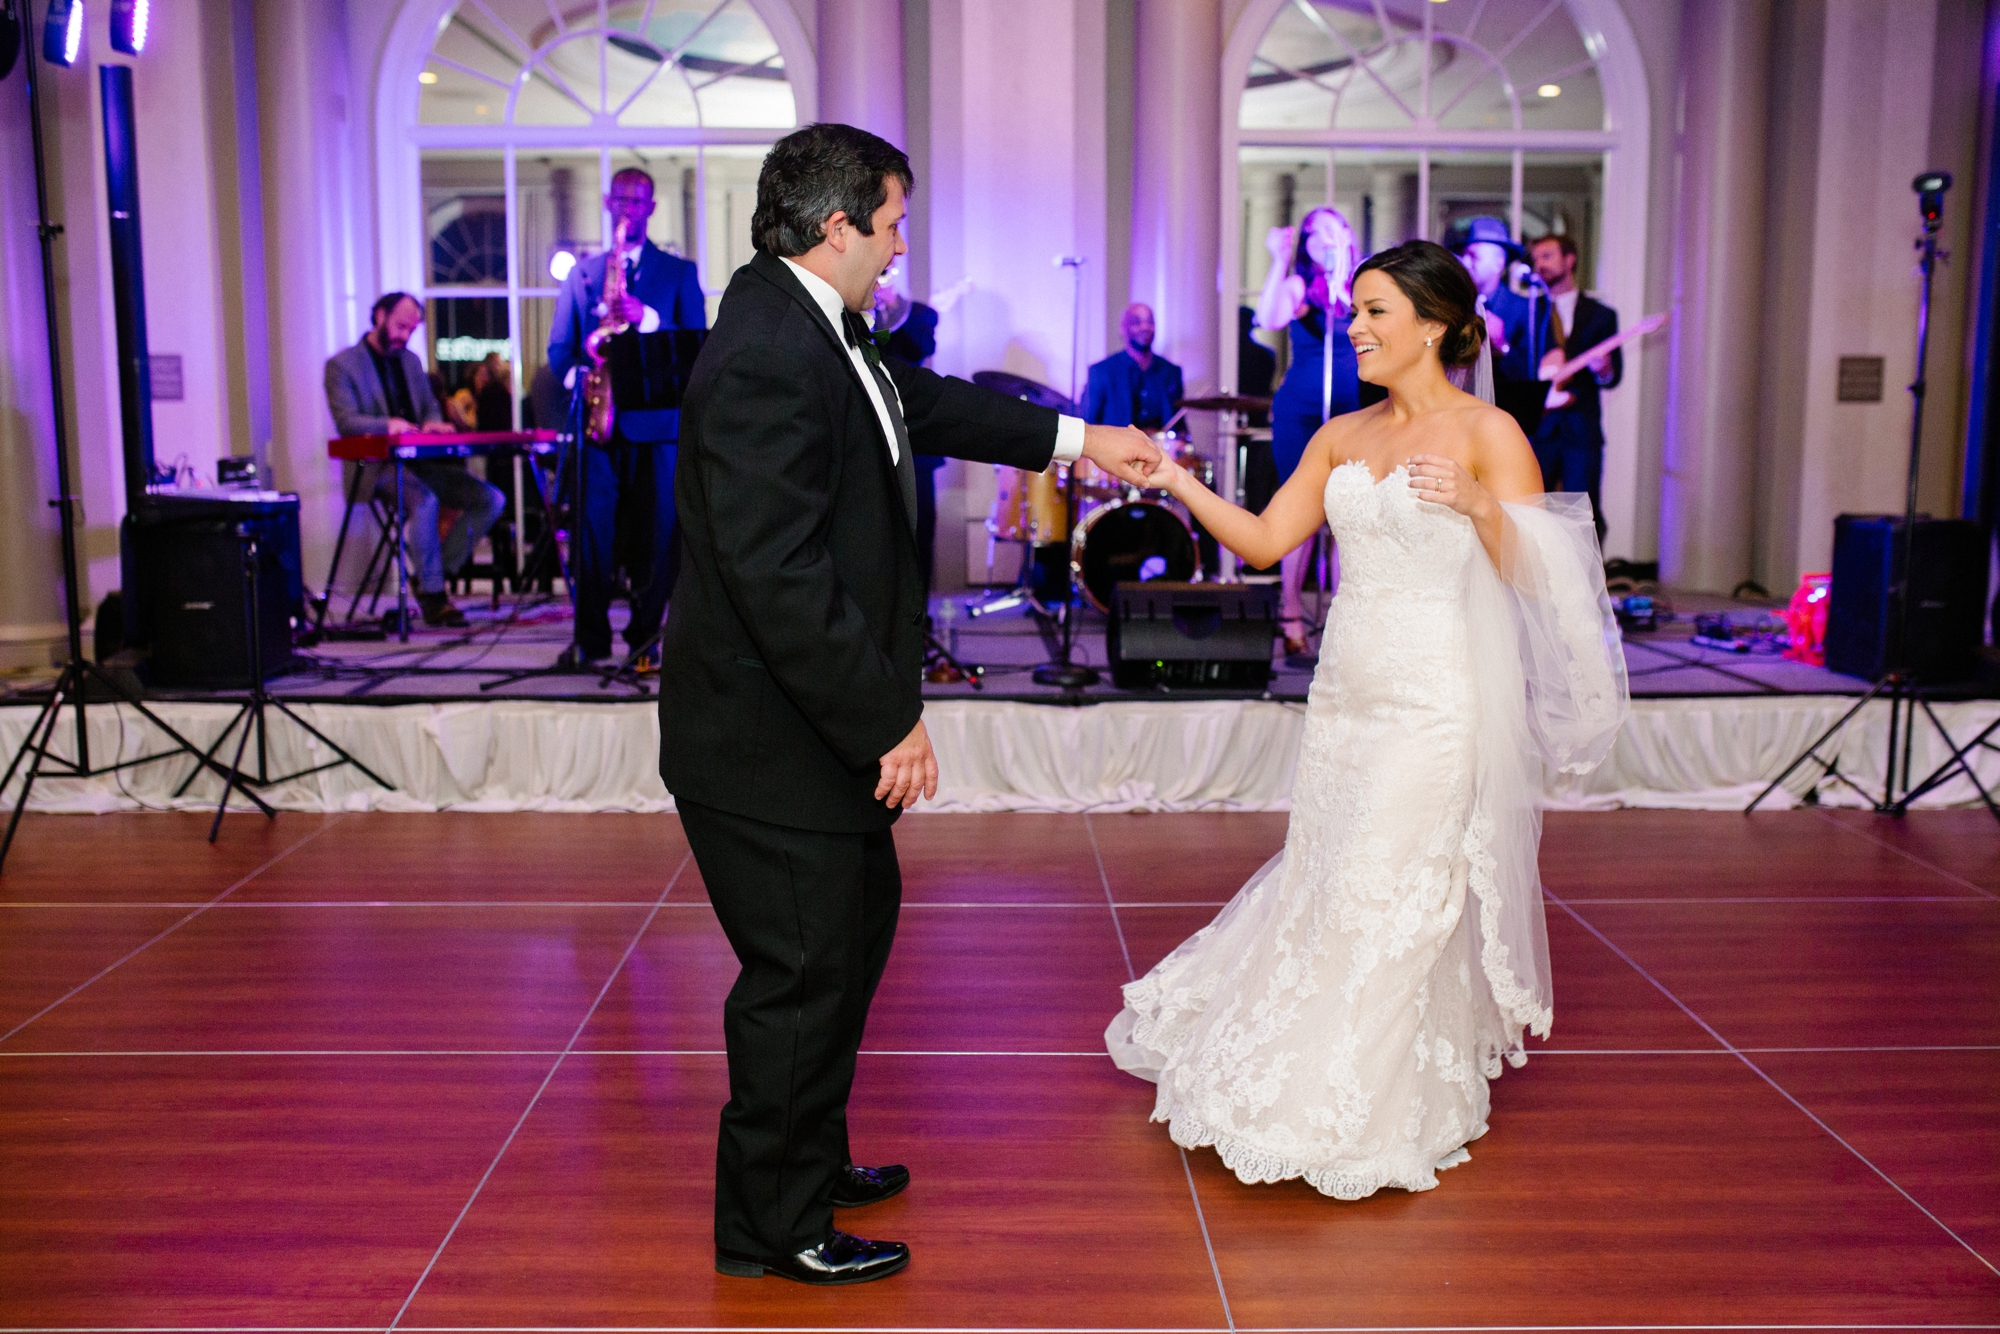 New_Orleans_Wedding_Photographer_0637.jpg